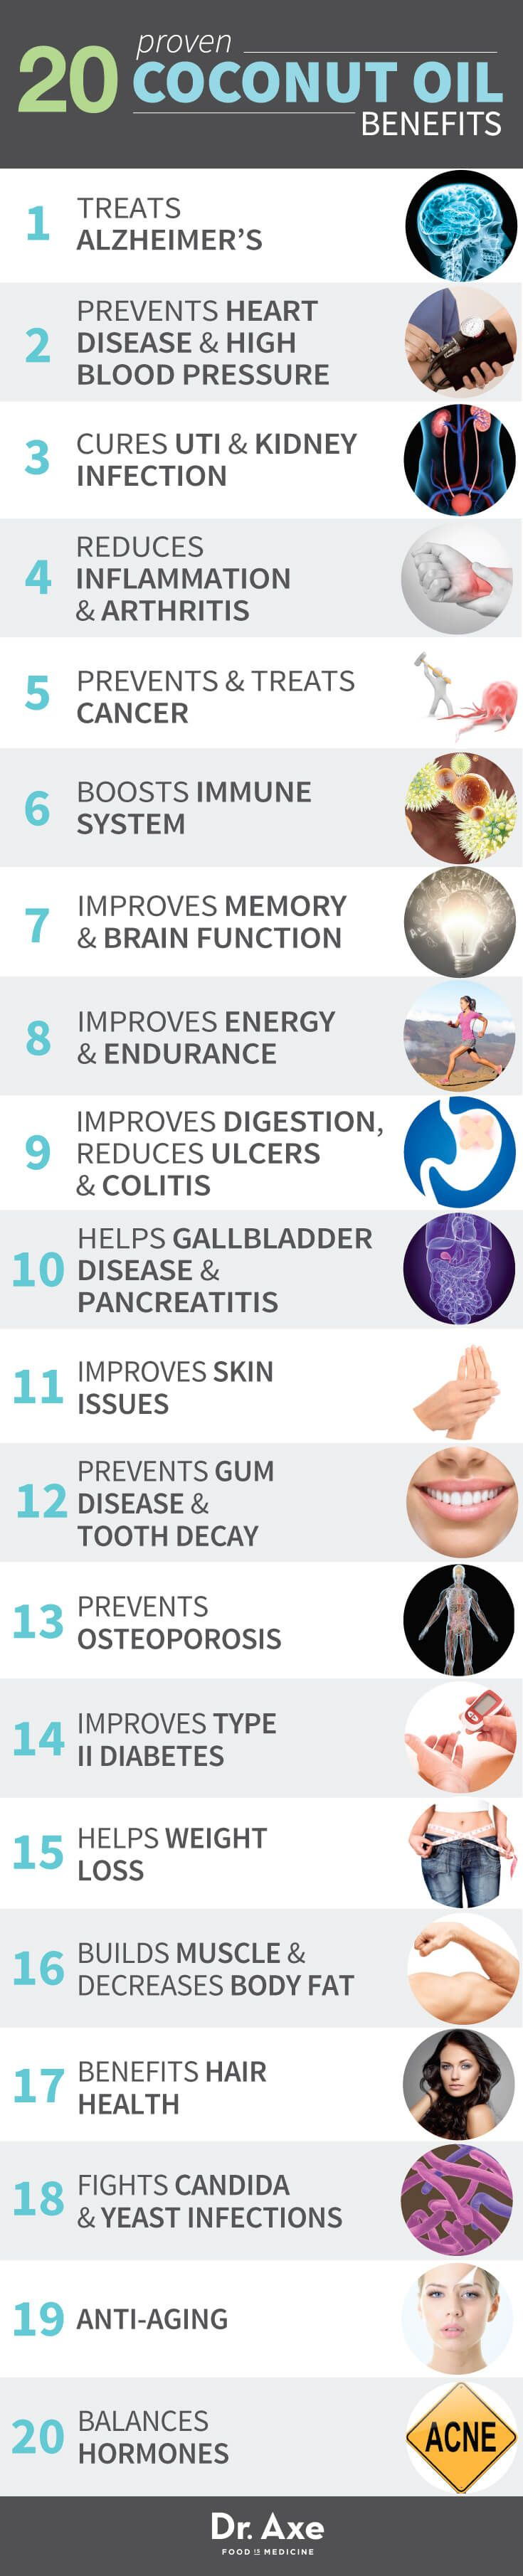 #coconutoil #naturalliving Proven Coconut Oil Health Benefits List infographic